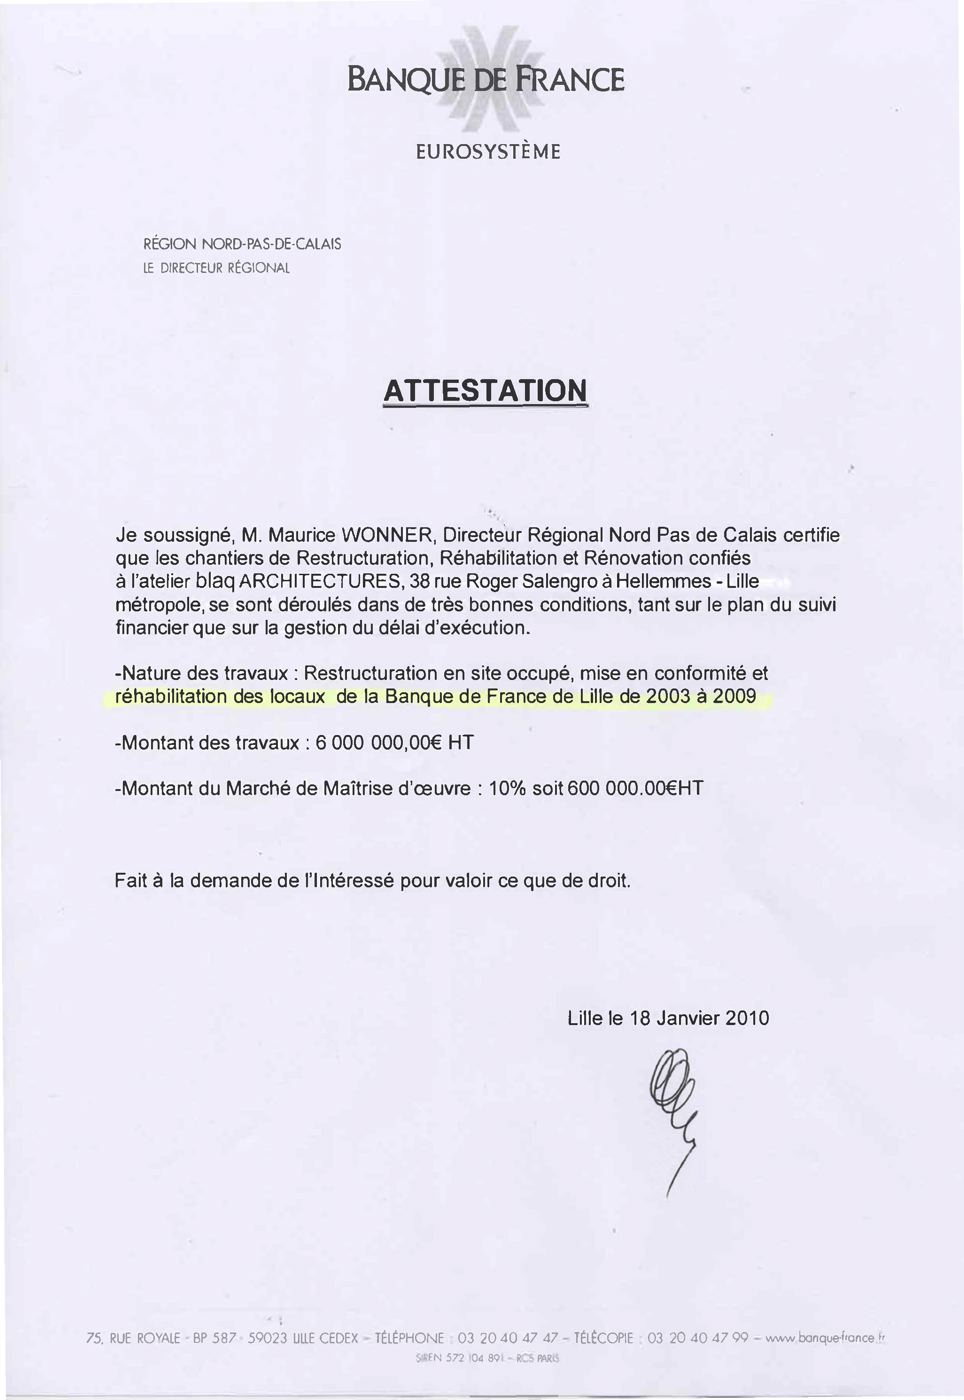 Banque de france attestation BDF.jpg